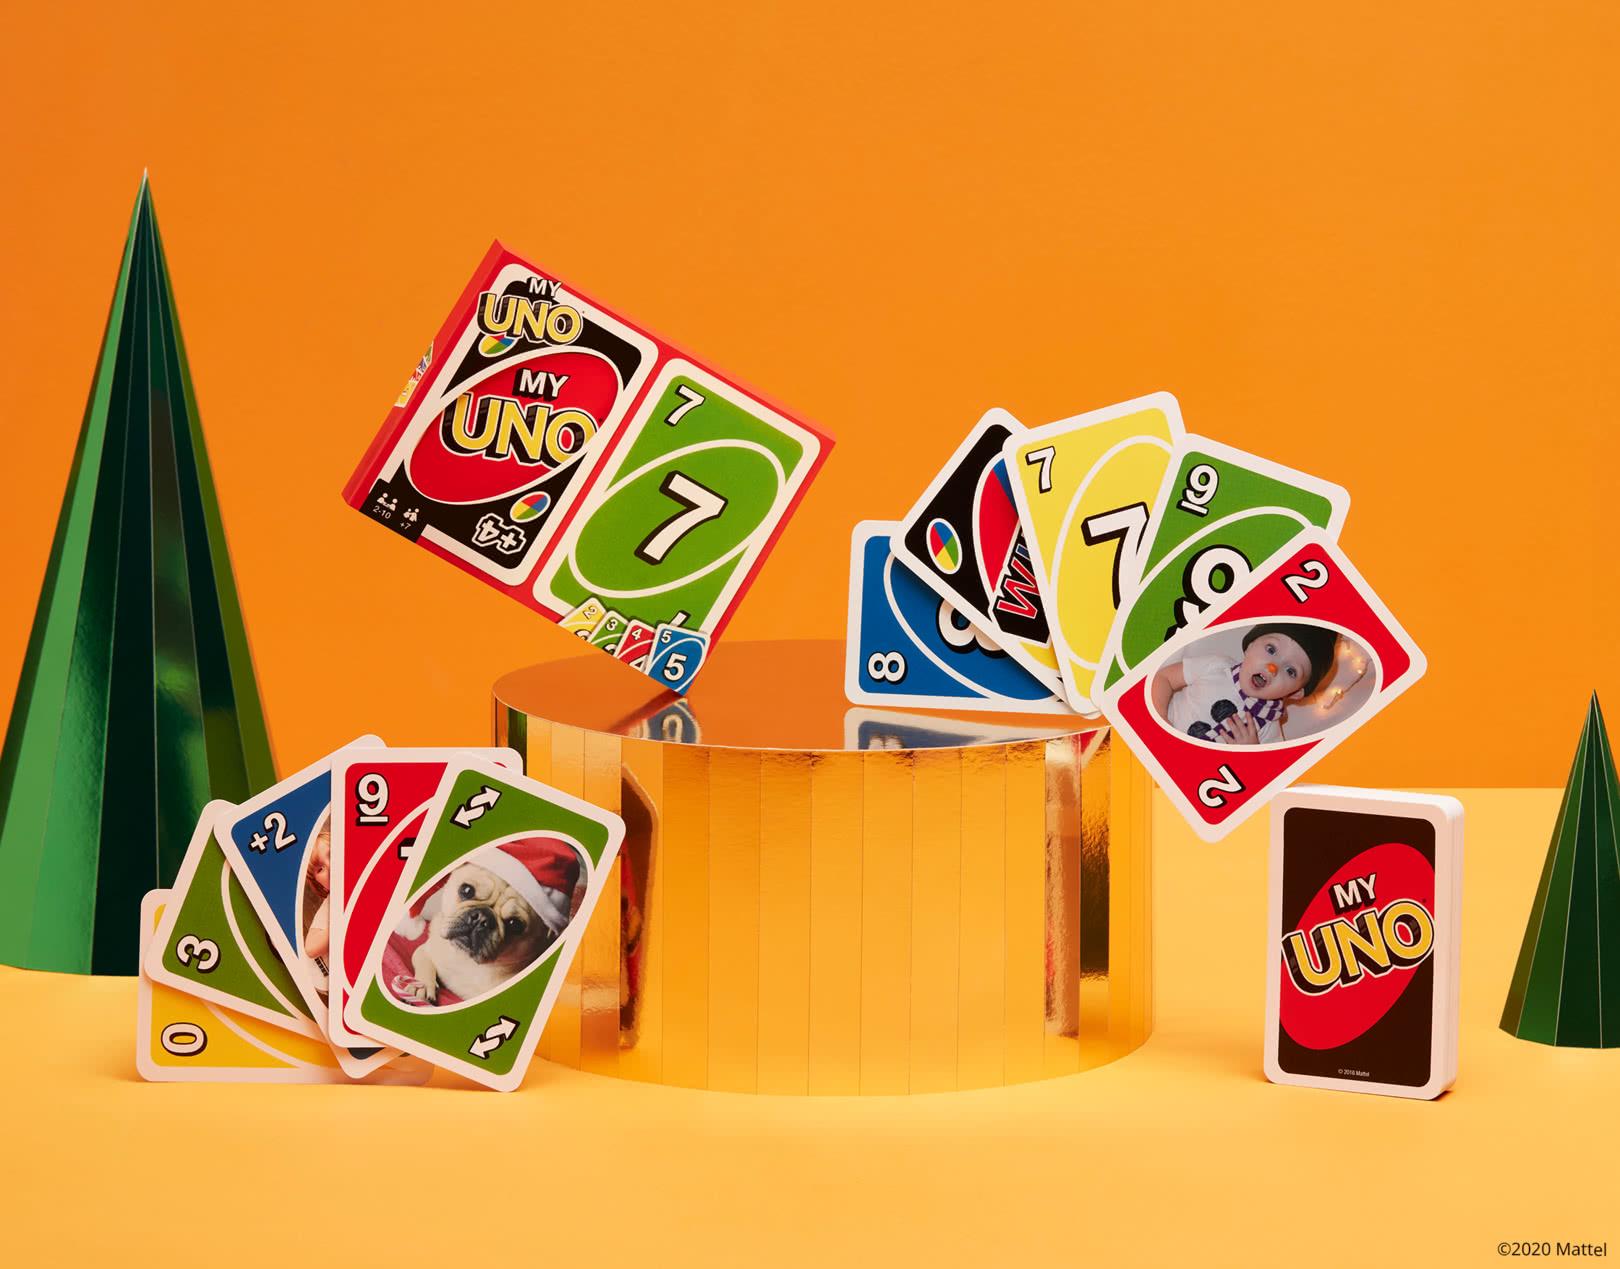 My Uno